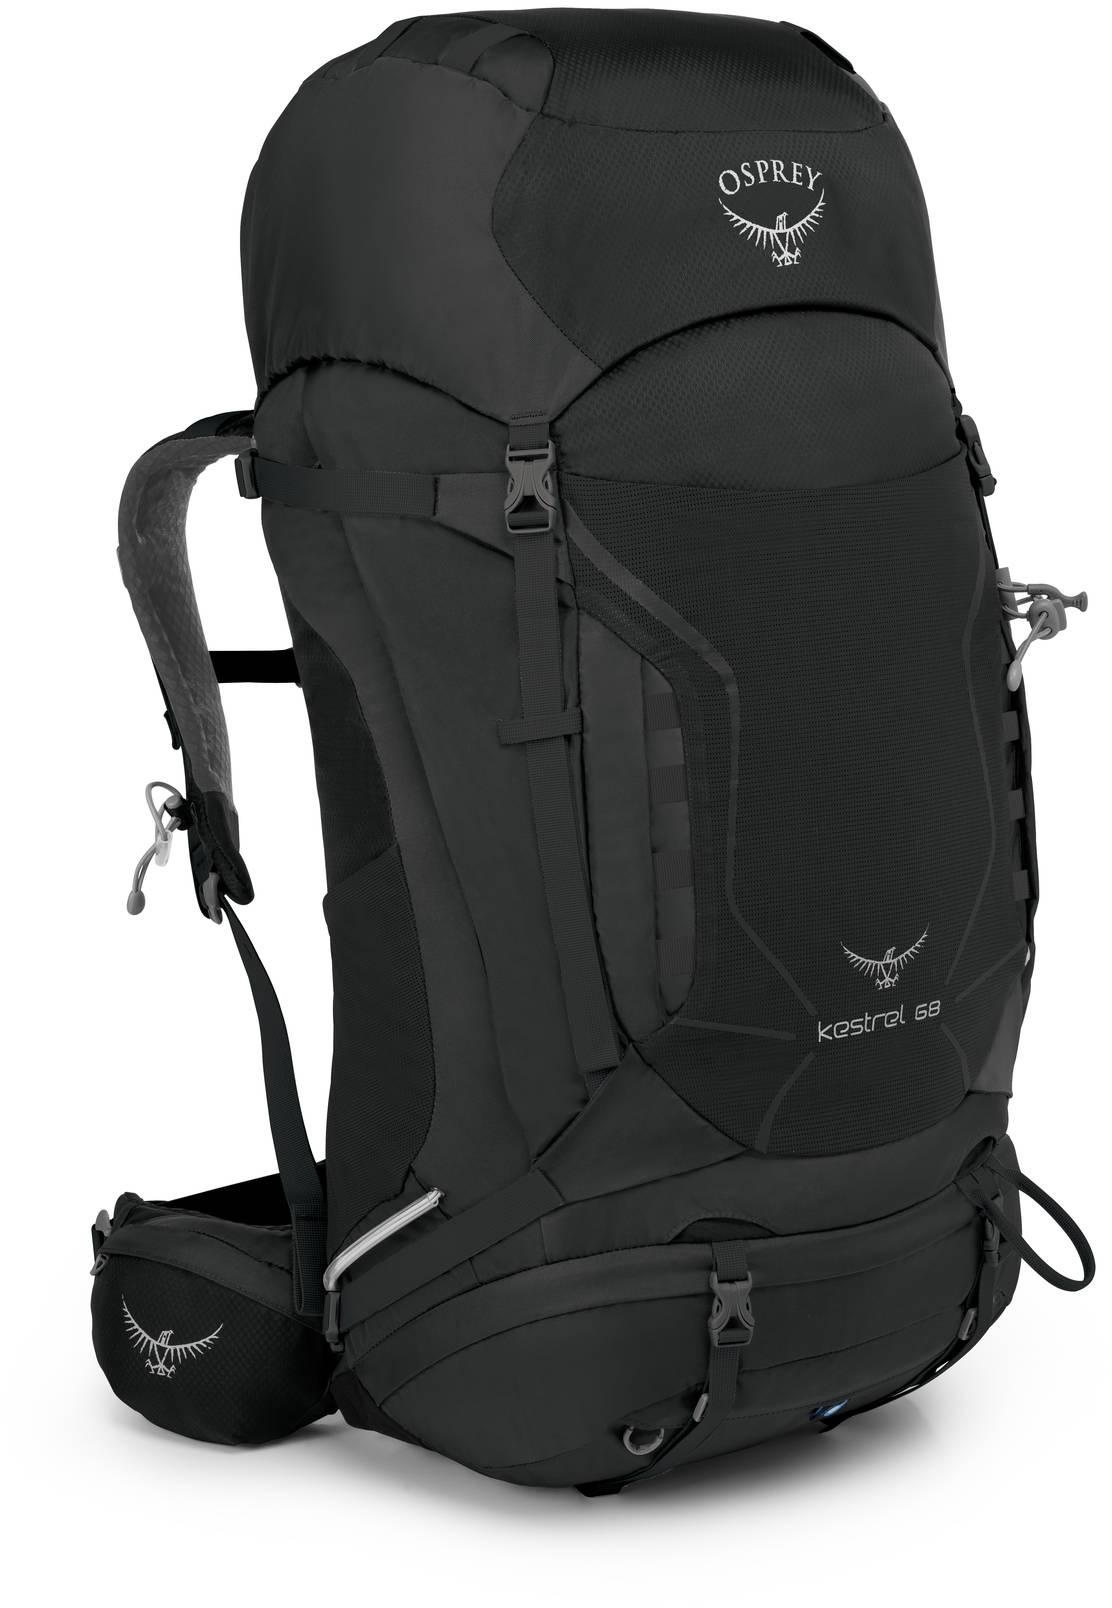 Туристические рюкзаки Рюкзак туристический Osprey Kestrel 68 Kestrel_68_Side_Ash_Grey_web.jpg